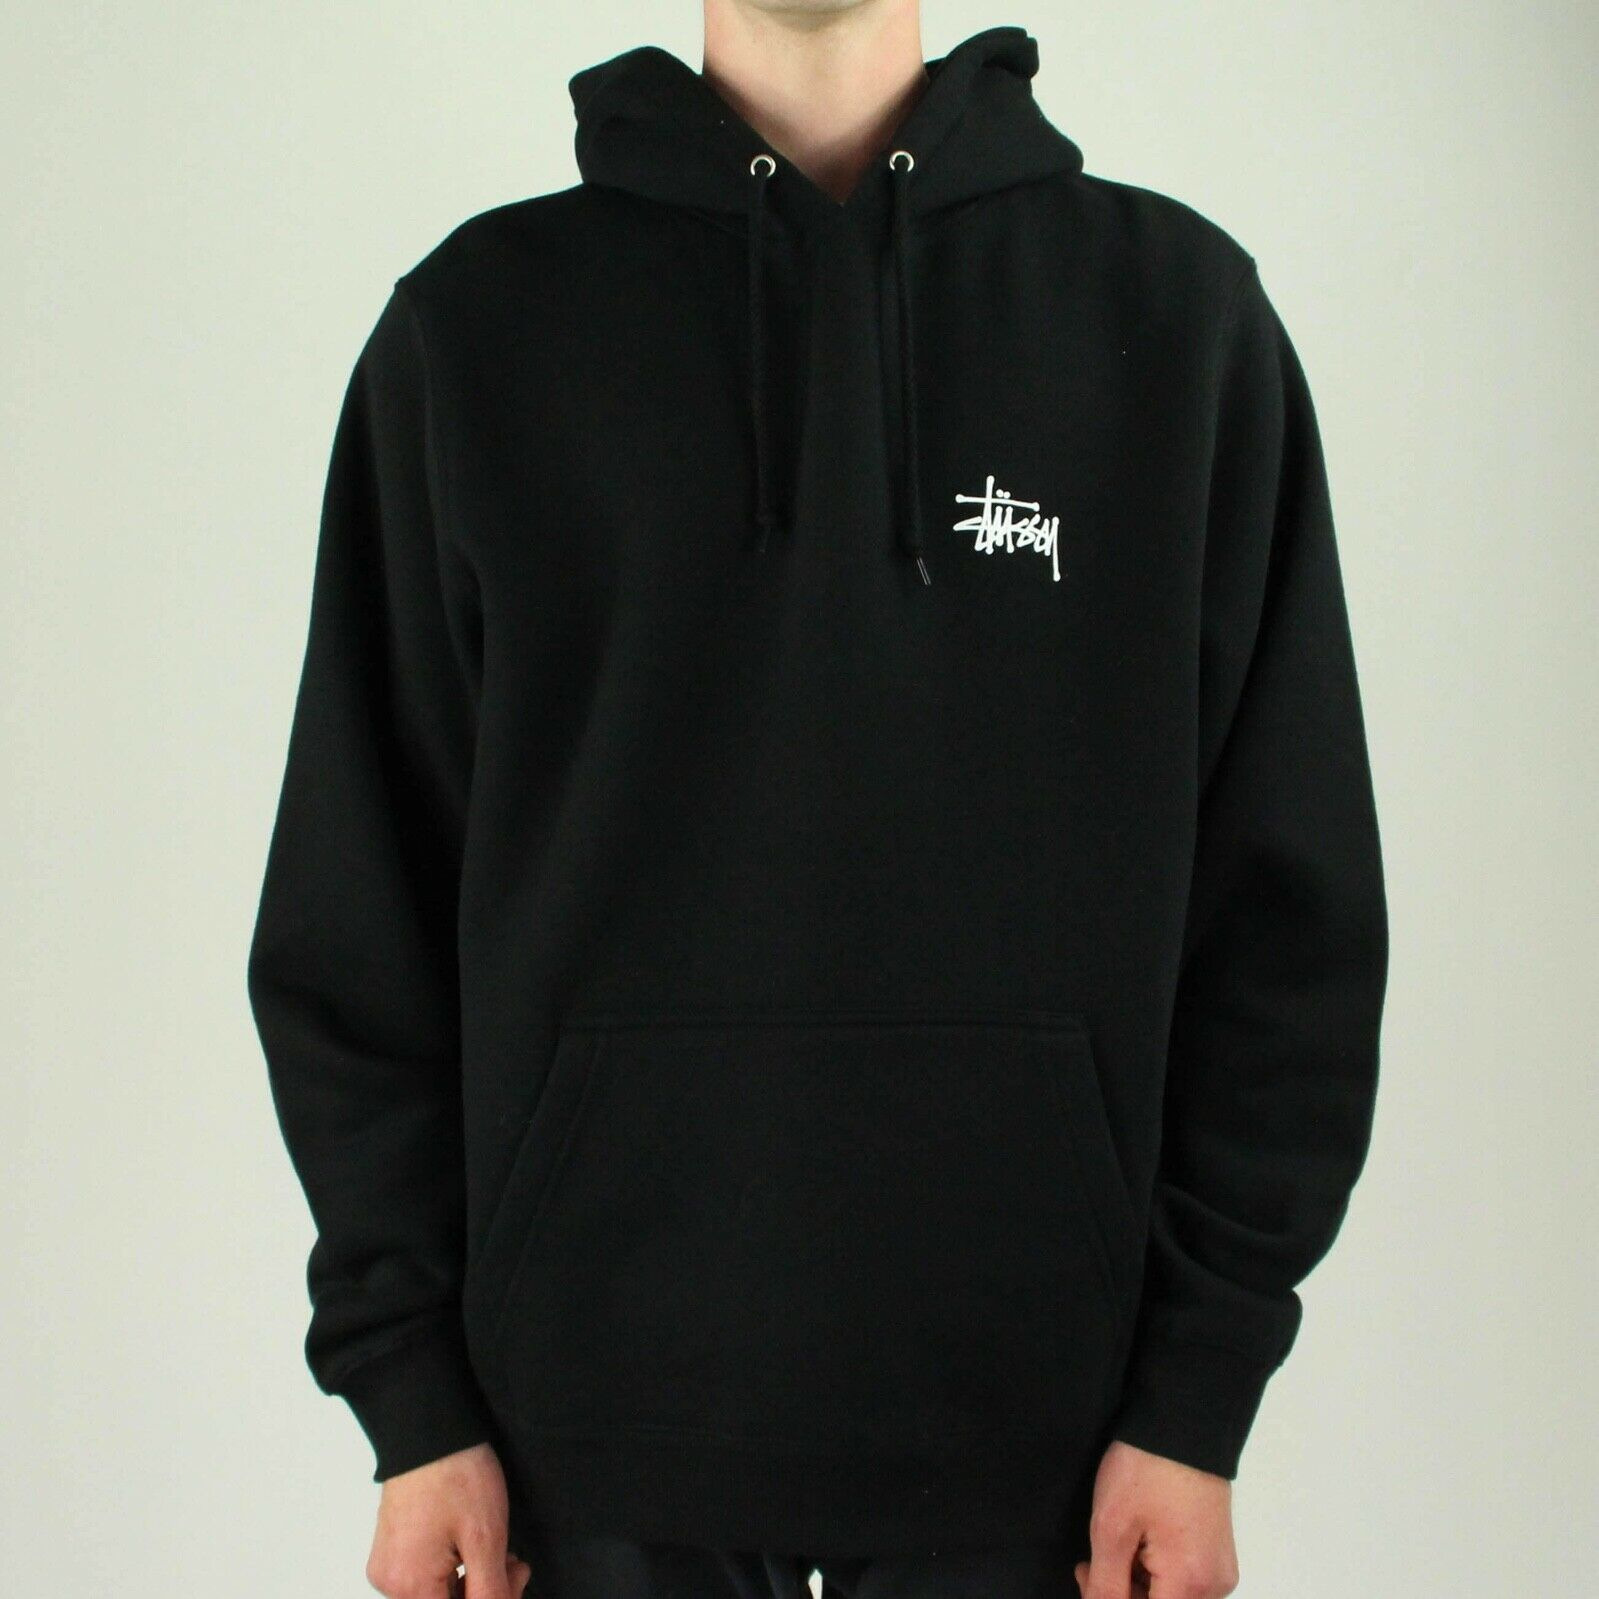 Details zu Stussy Basic Logo Hooded Sweatshirt Hoodie in Black in Size S,M,L,XL